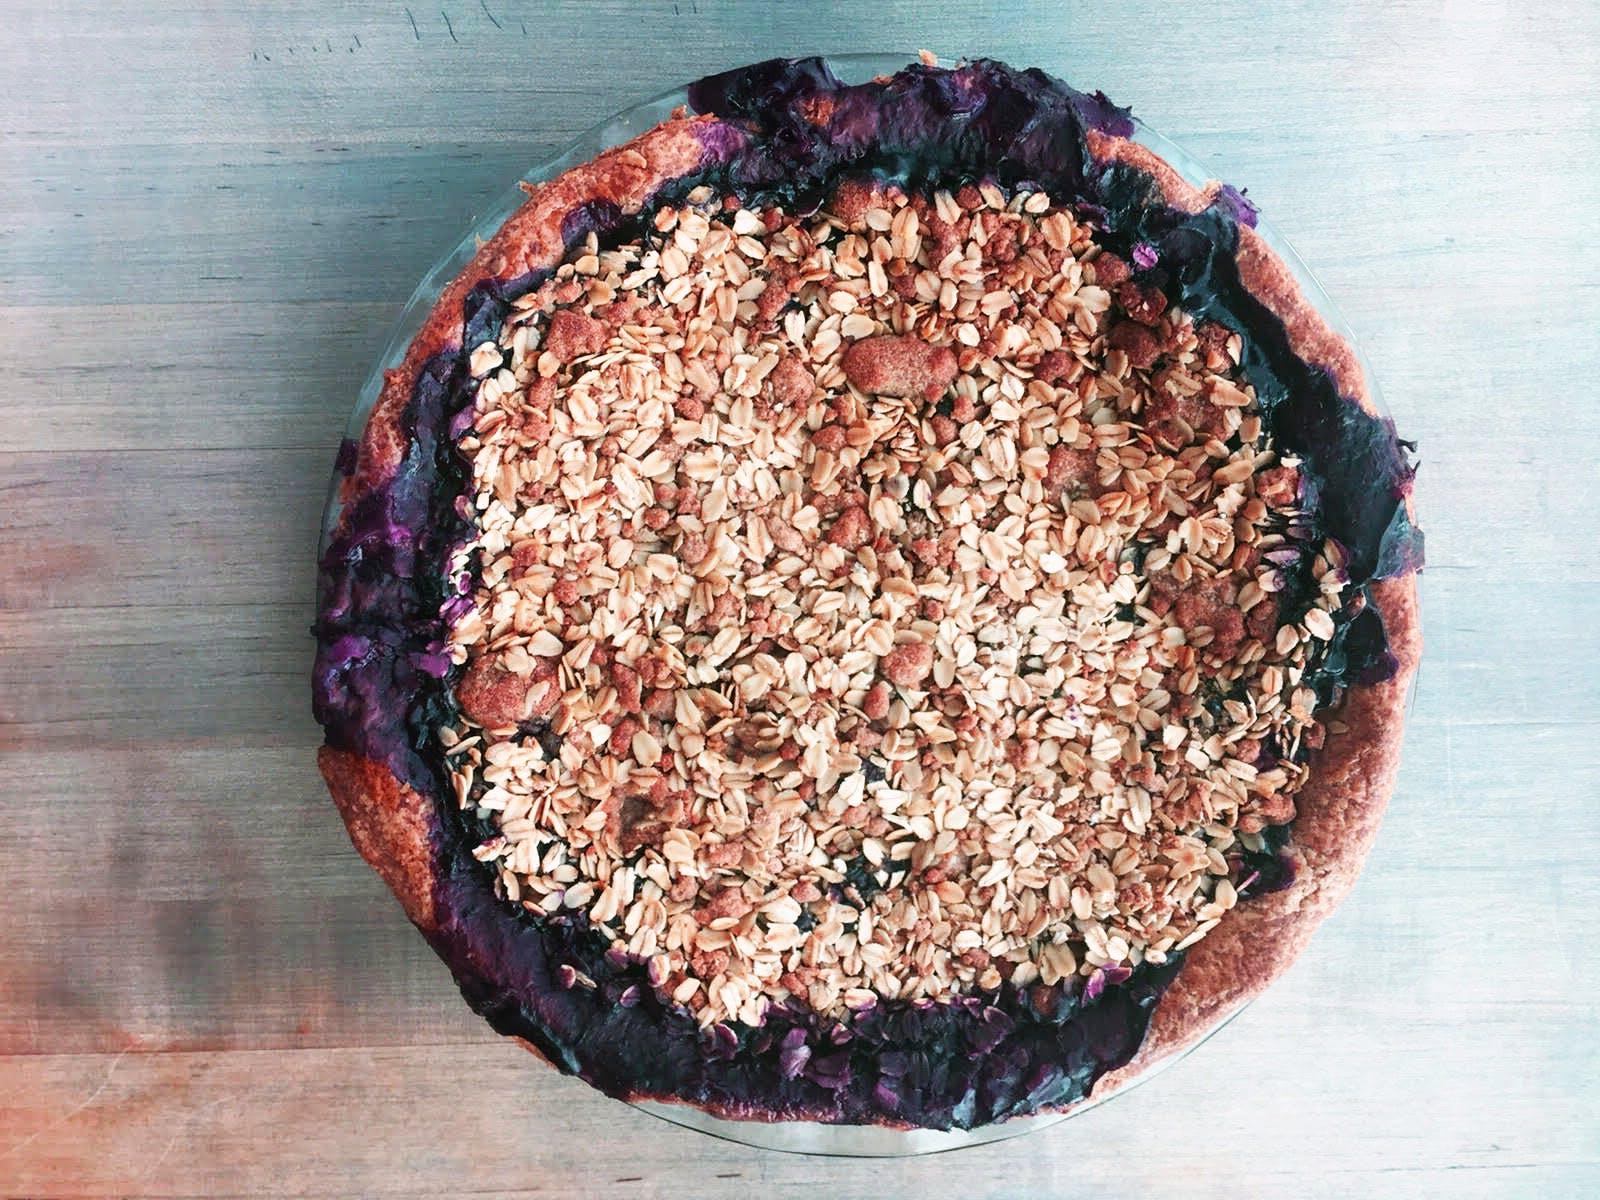 Blueberry Pie at Love   Salt photoshopped